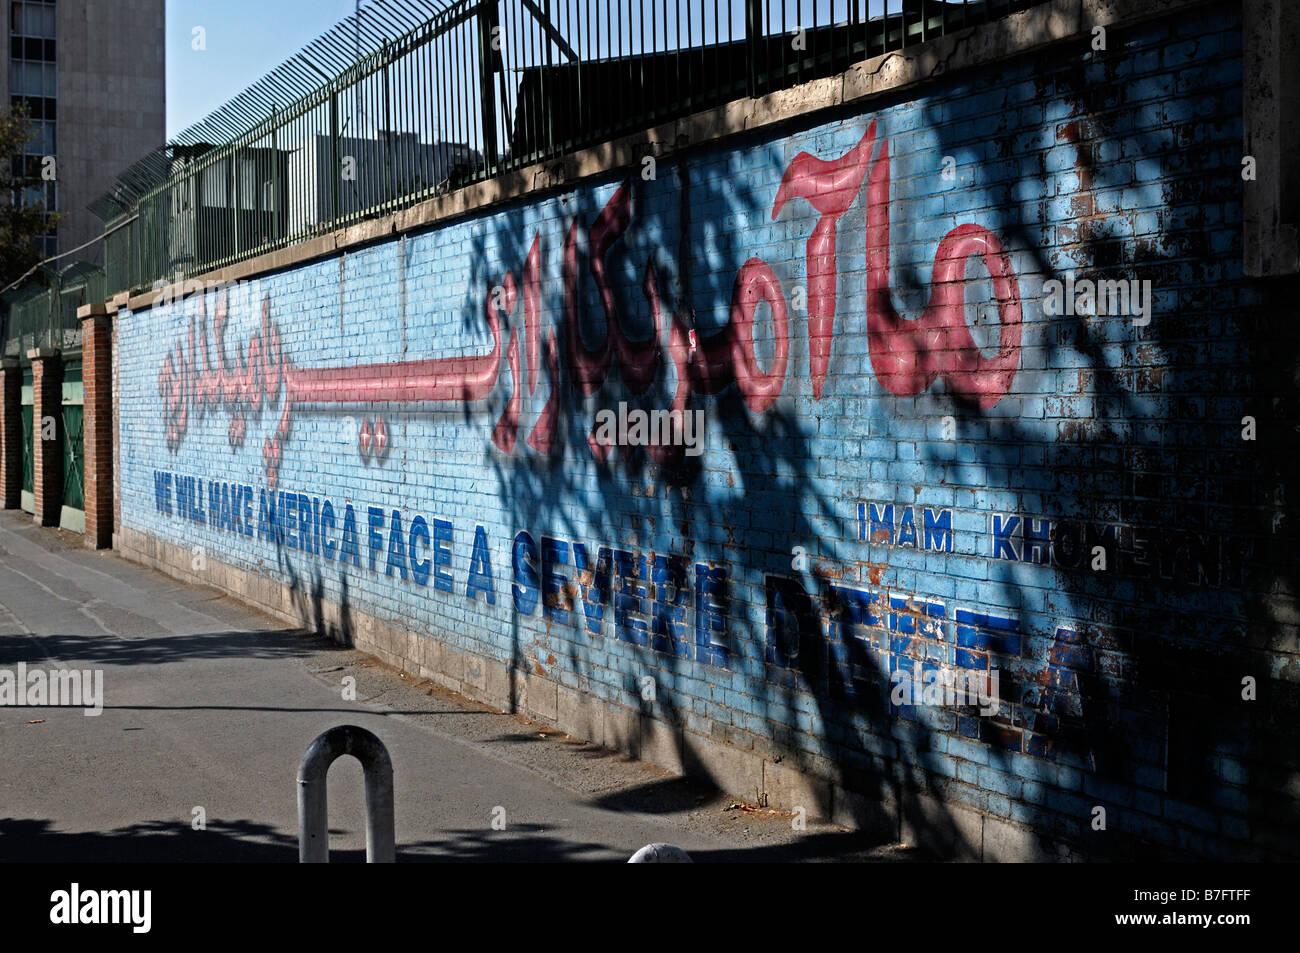 anti american anti-american mural propoganda slogan berate former US united states embassy tehran implied imply - Stock Image